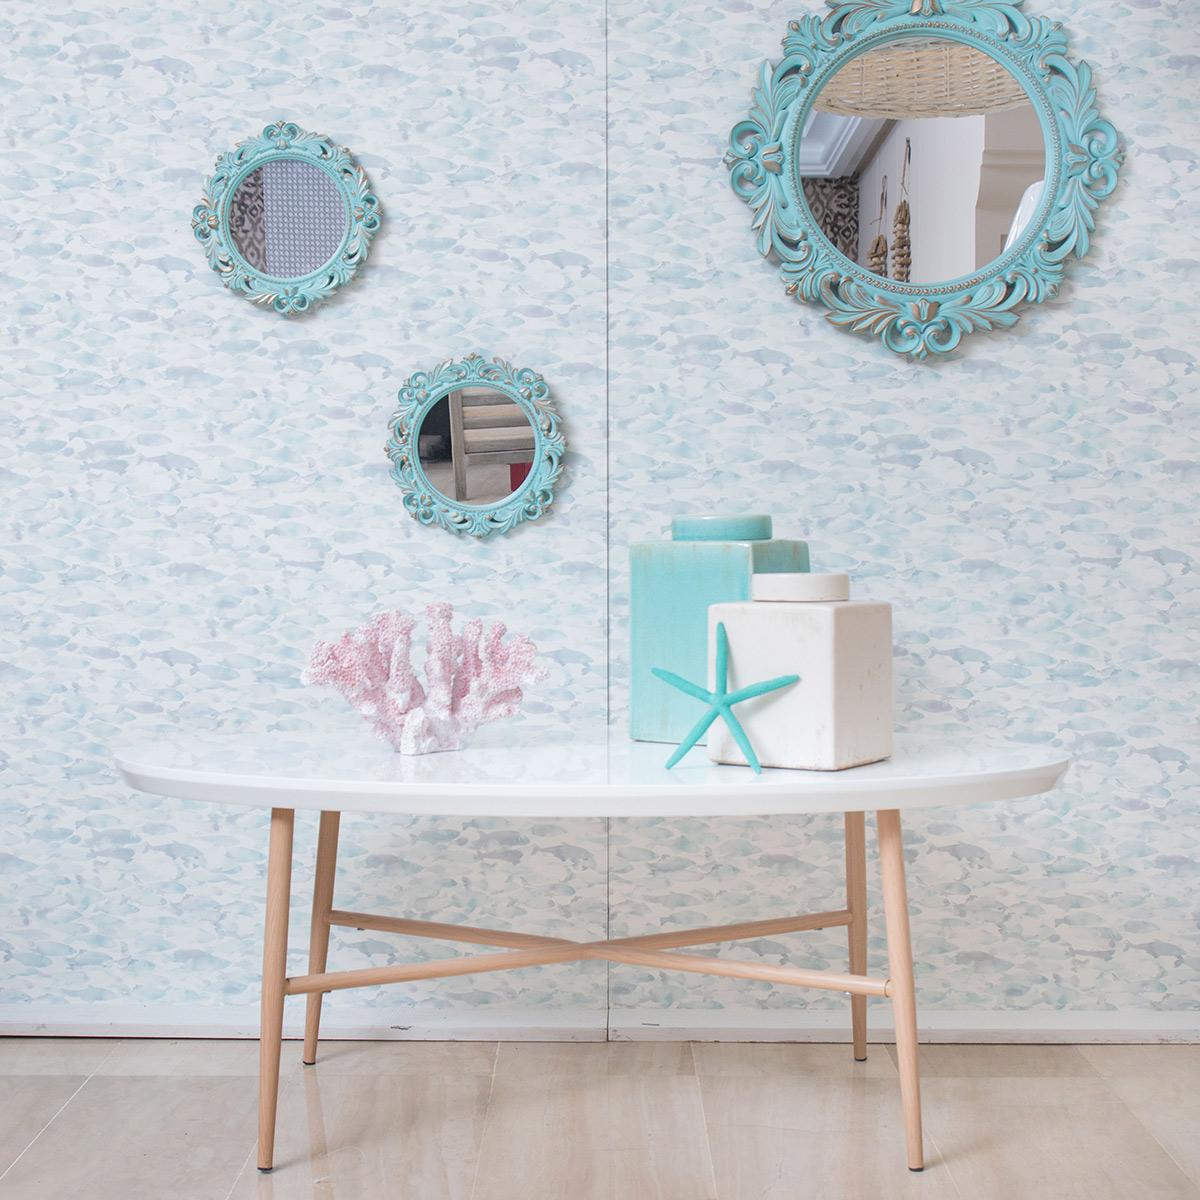 espejos-turquesa-ambiente-marino